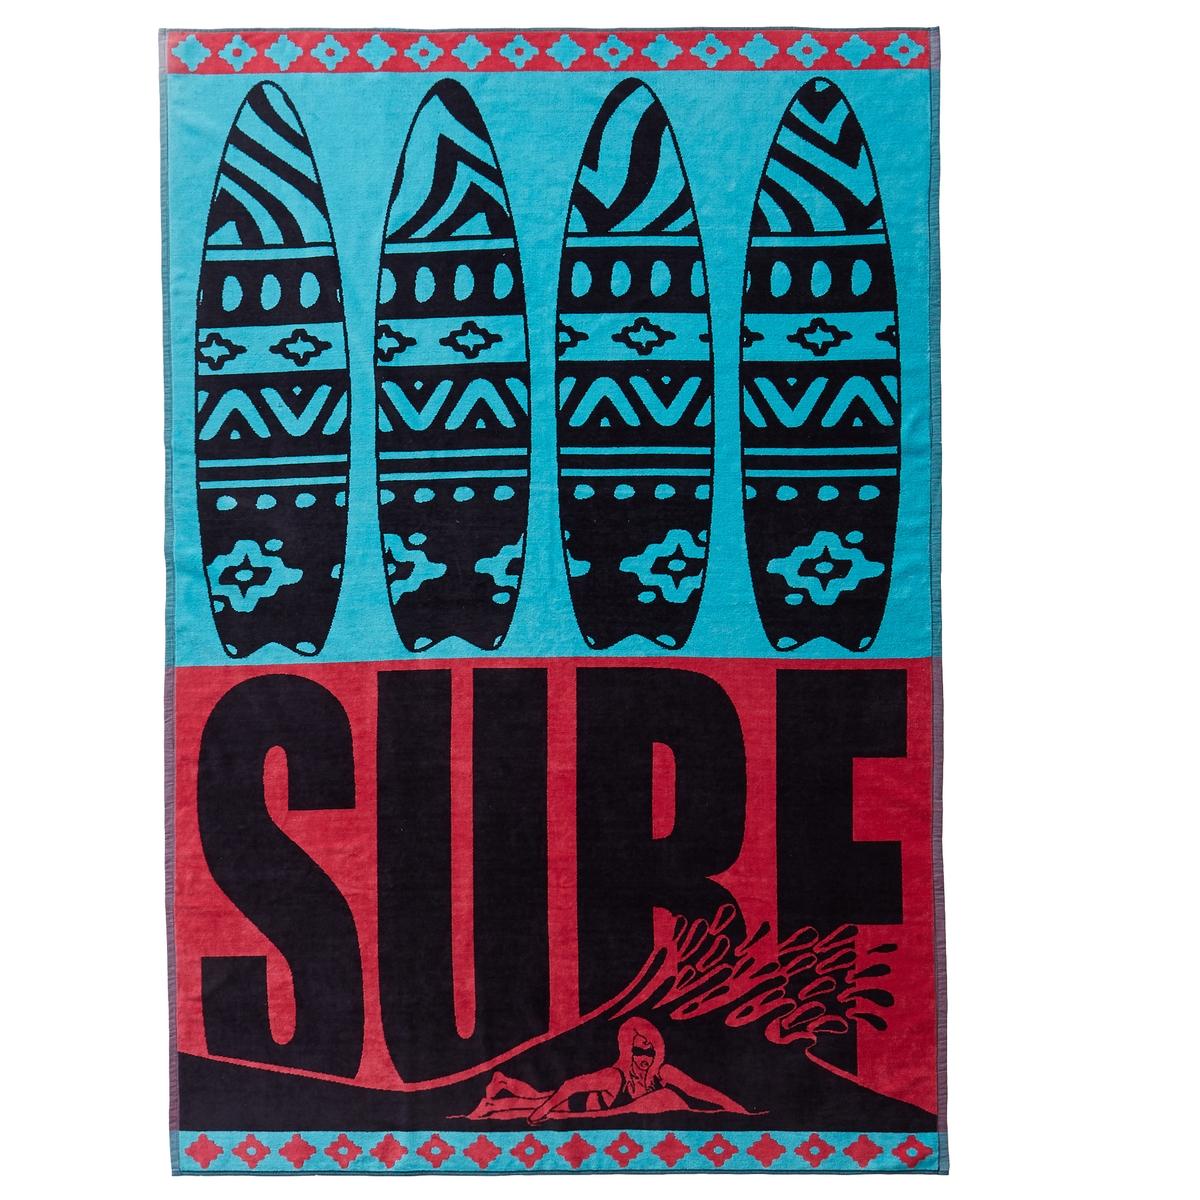 Полотенце пляжное XL BondiПолотенце пляжное с жаккардовым рисунком XL BondiХарактеристики пляжного полотенца XL Bondi :Махровая ткань из велюра с жаккардовым рисунком, 100% хлопок.420 г/м?.Машинная стирка при 60 °С.Размеры пляжного полотенца XL Brisaca :140 x 200 см.<br><br>Цвет: синий/ розовый